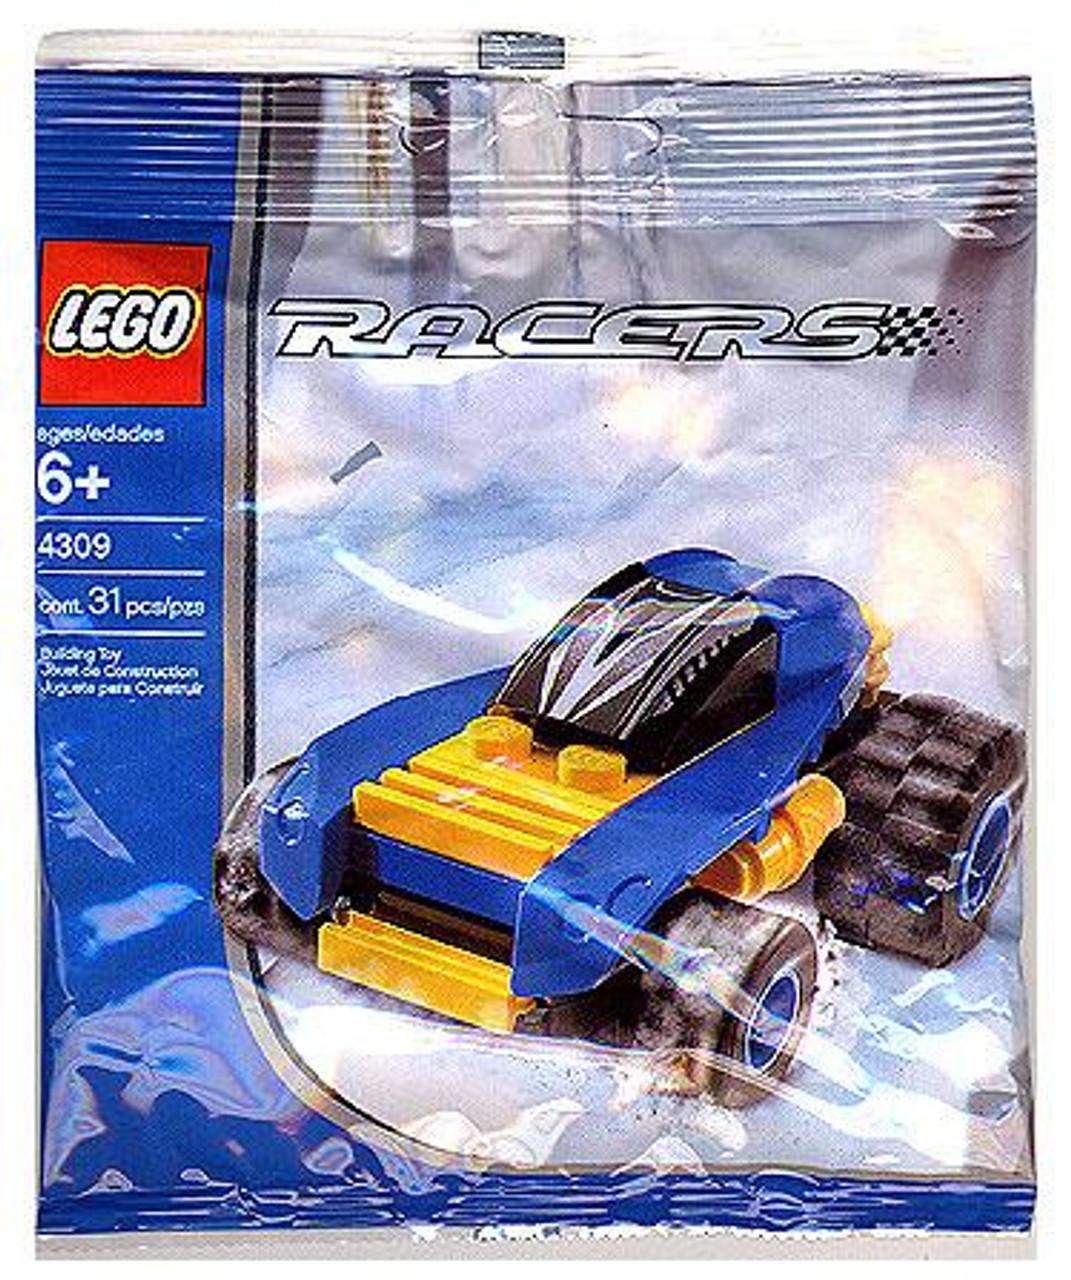 LEGO Racers Blue Racer Mini Set #4309 [Bagged]